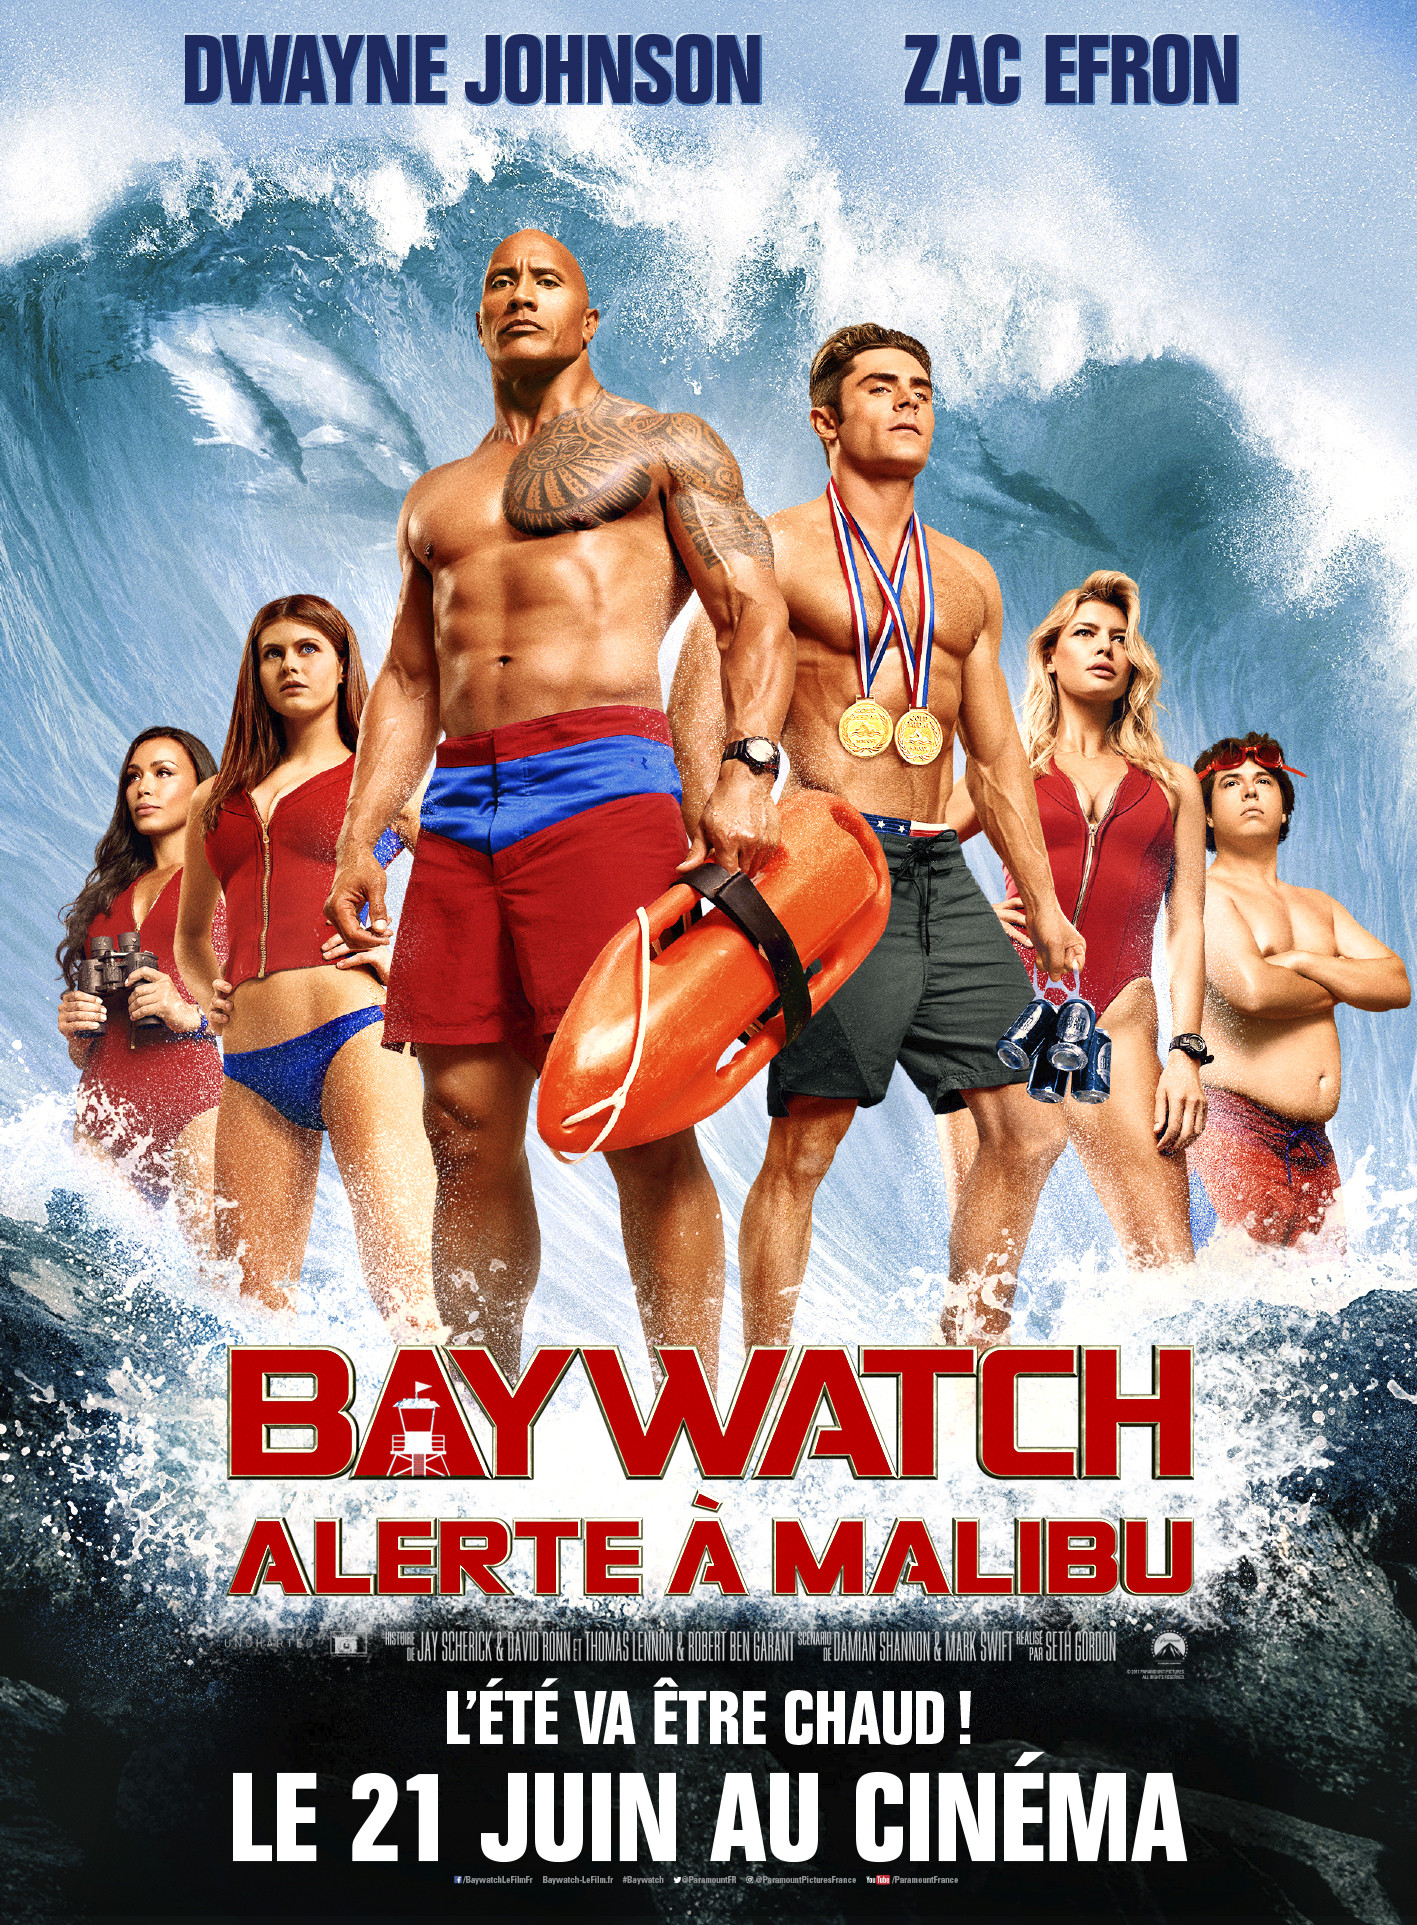 baywatch alerte à malibu utorrent